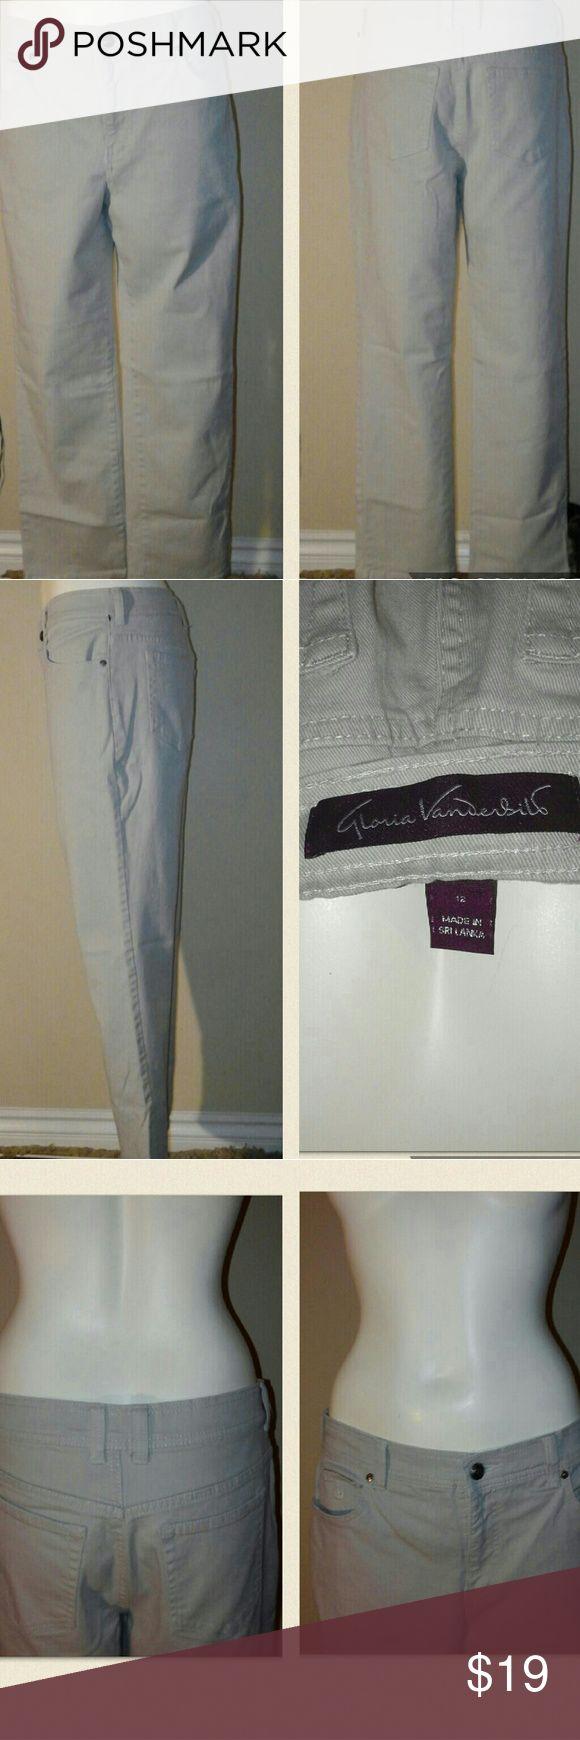 Gloria Vanderbilt Womens Short tan beige jeans. Short Tan beige Jeans Straight Leg Stretch 29 inseam. Gloria Vanderbilt Jeans Straight Leg